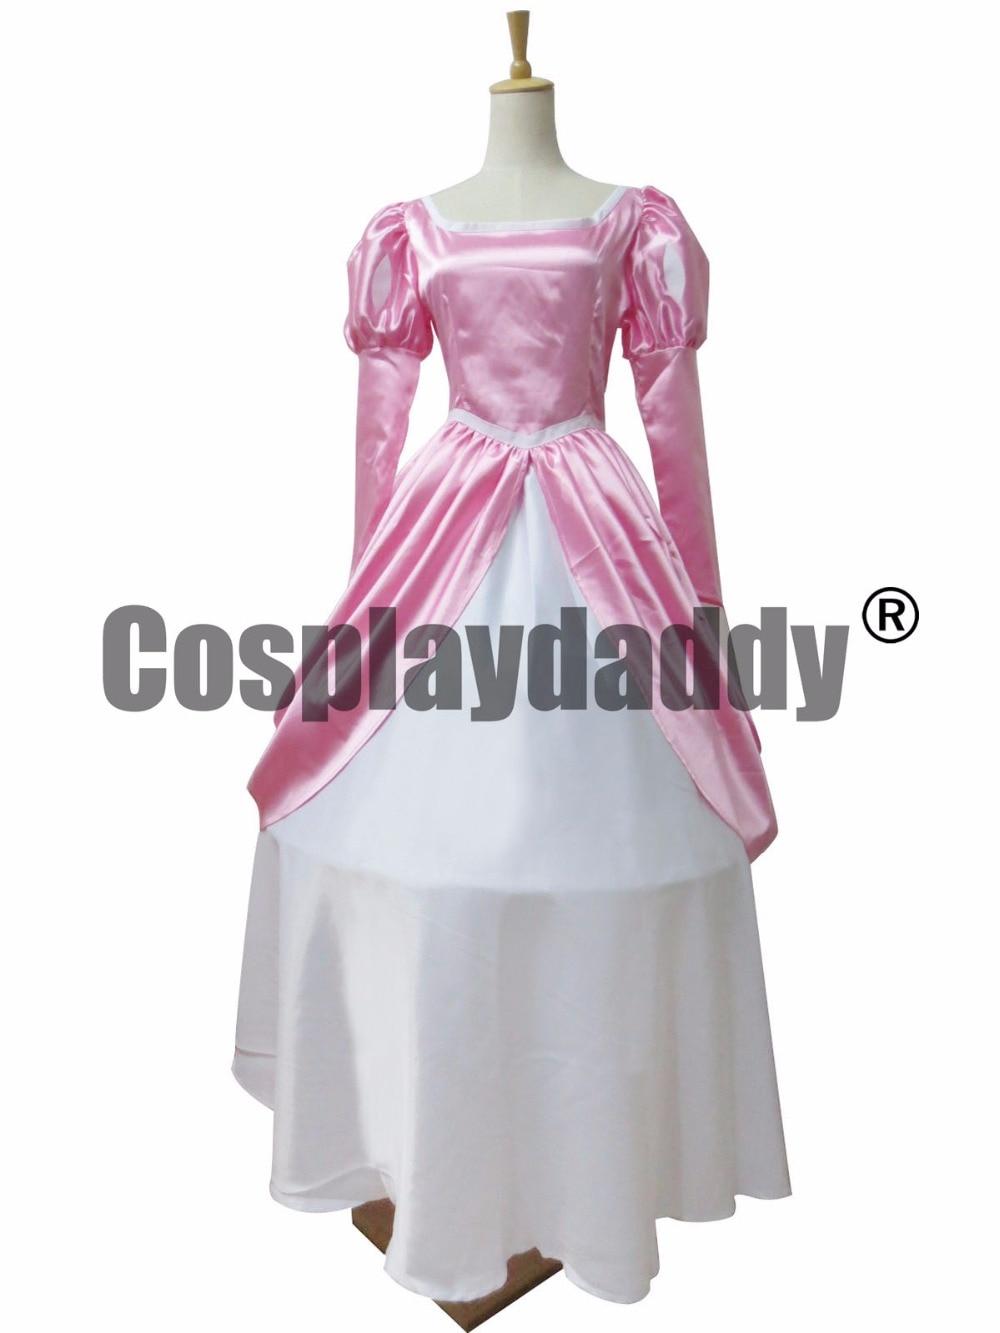 The Little Mermaid princess Ariel Pink Dress Cosplay Costume anysize F008